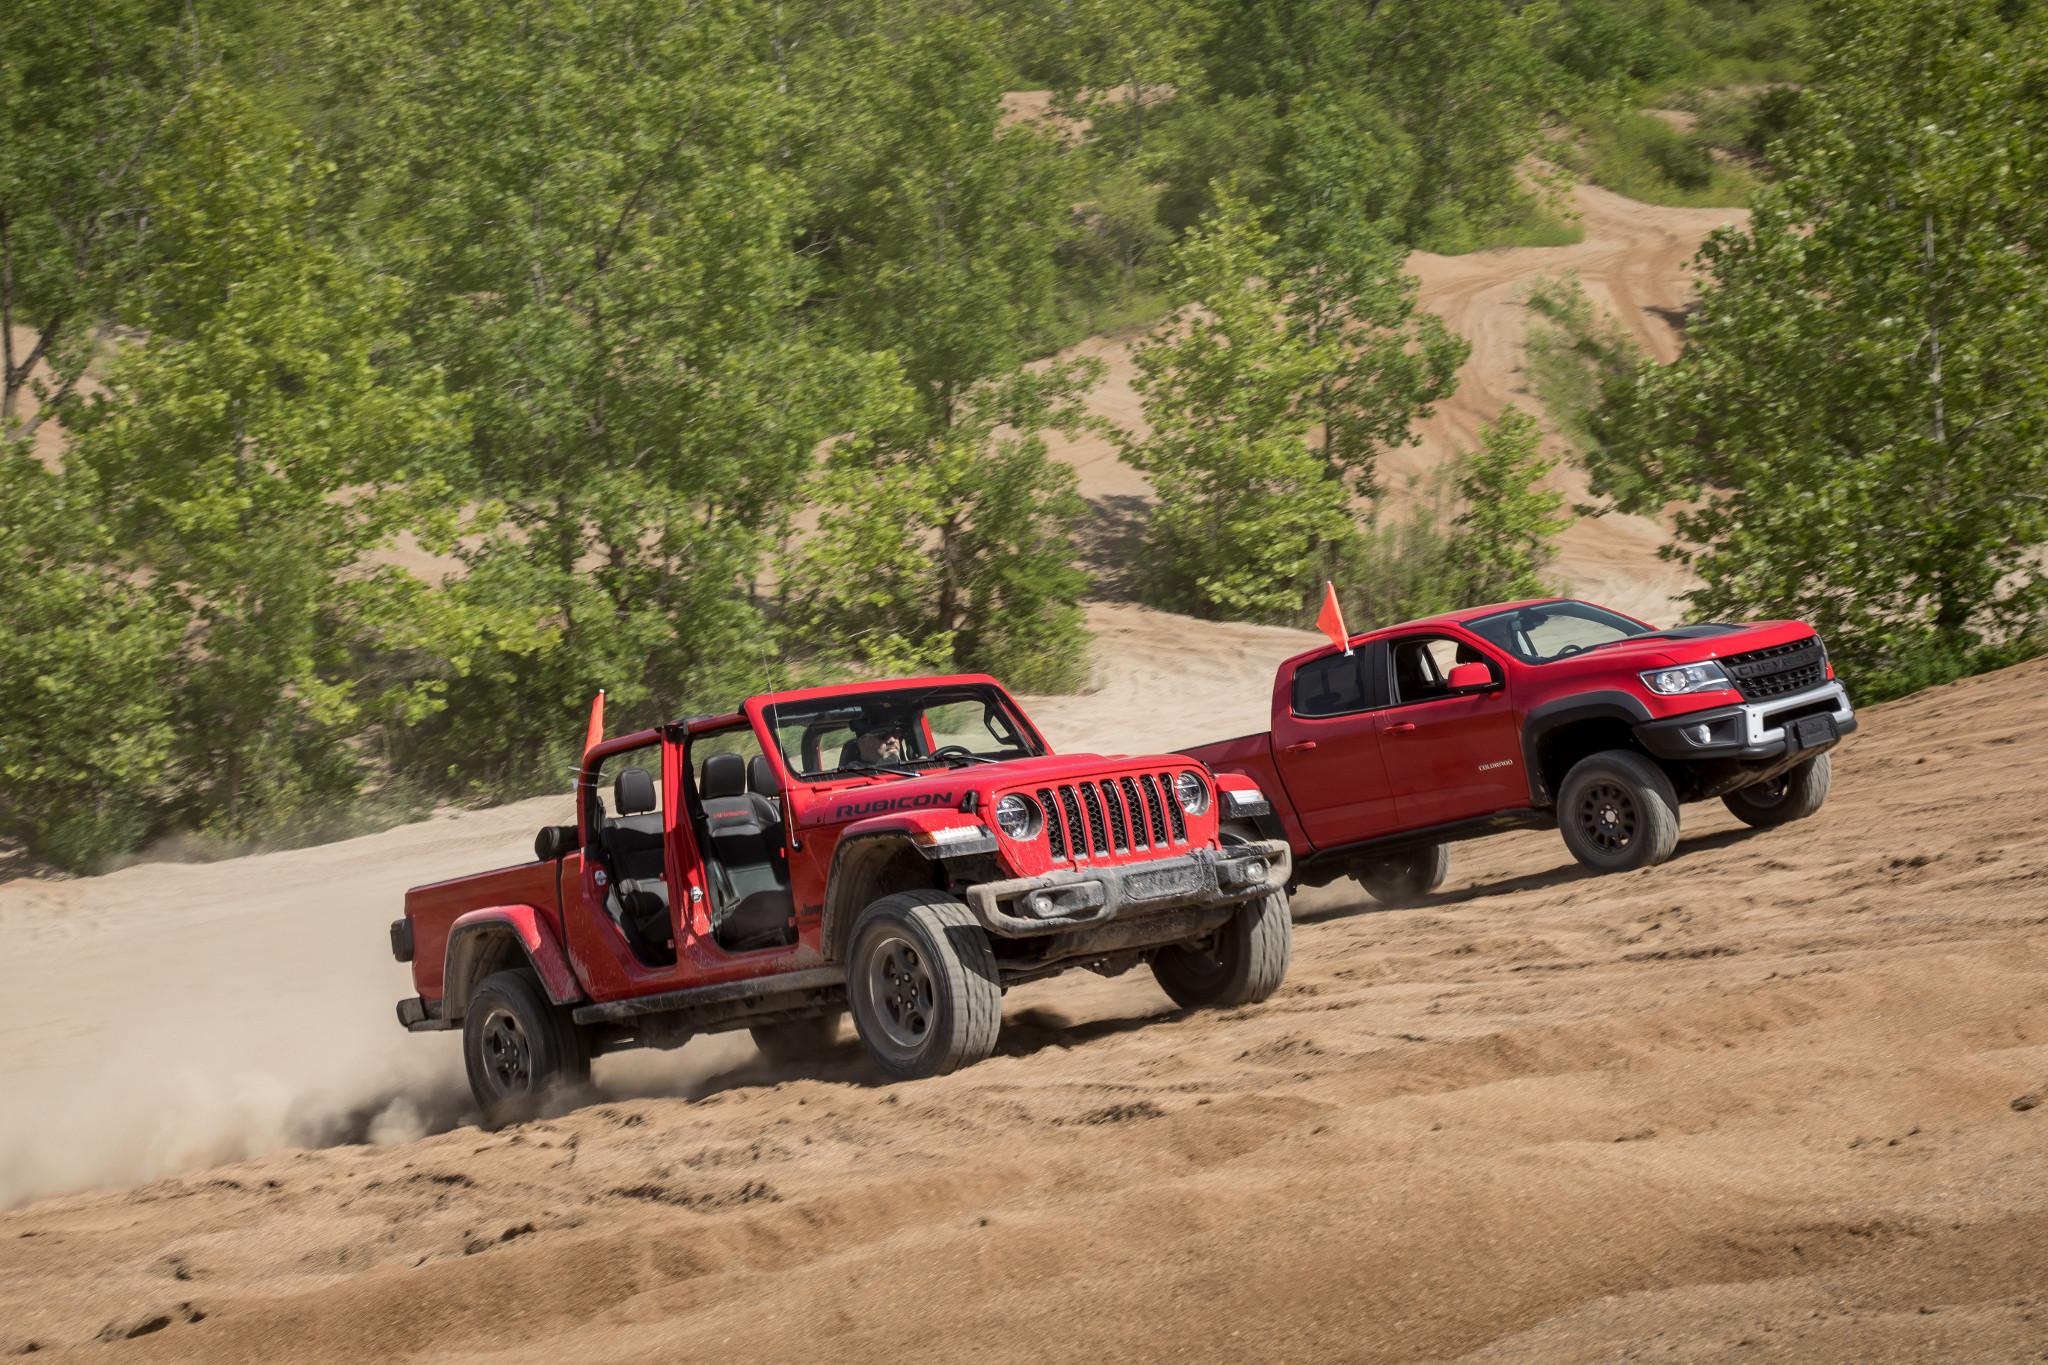 Doorless 2020 Jeep Gladiator Isn't Just for Fun